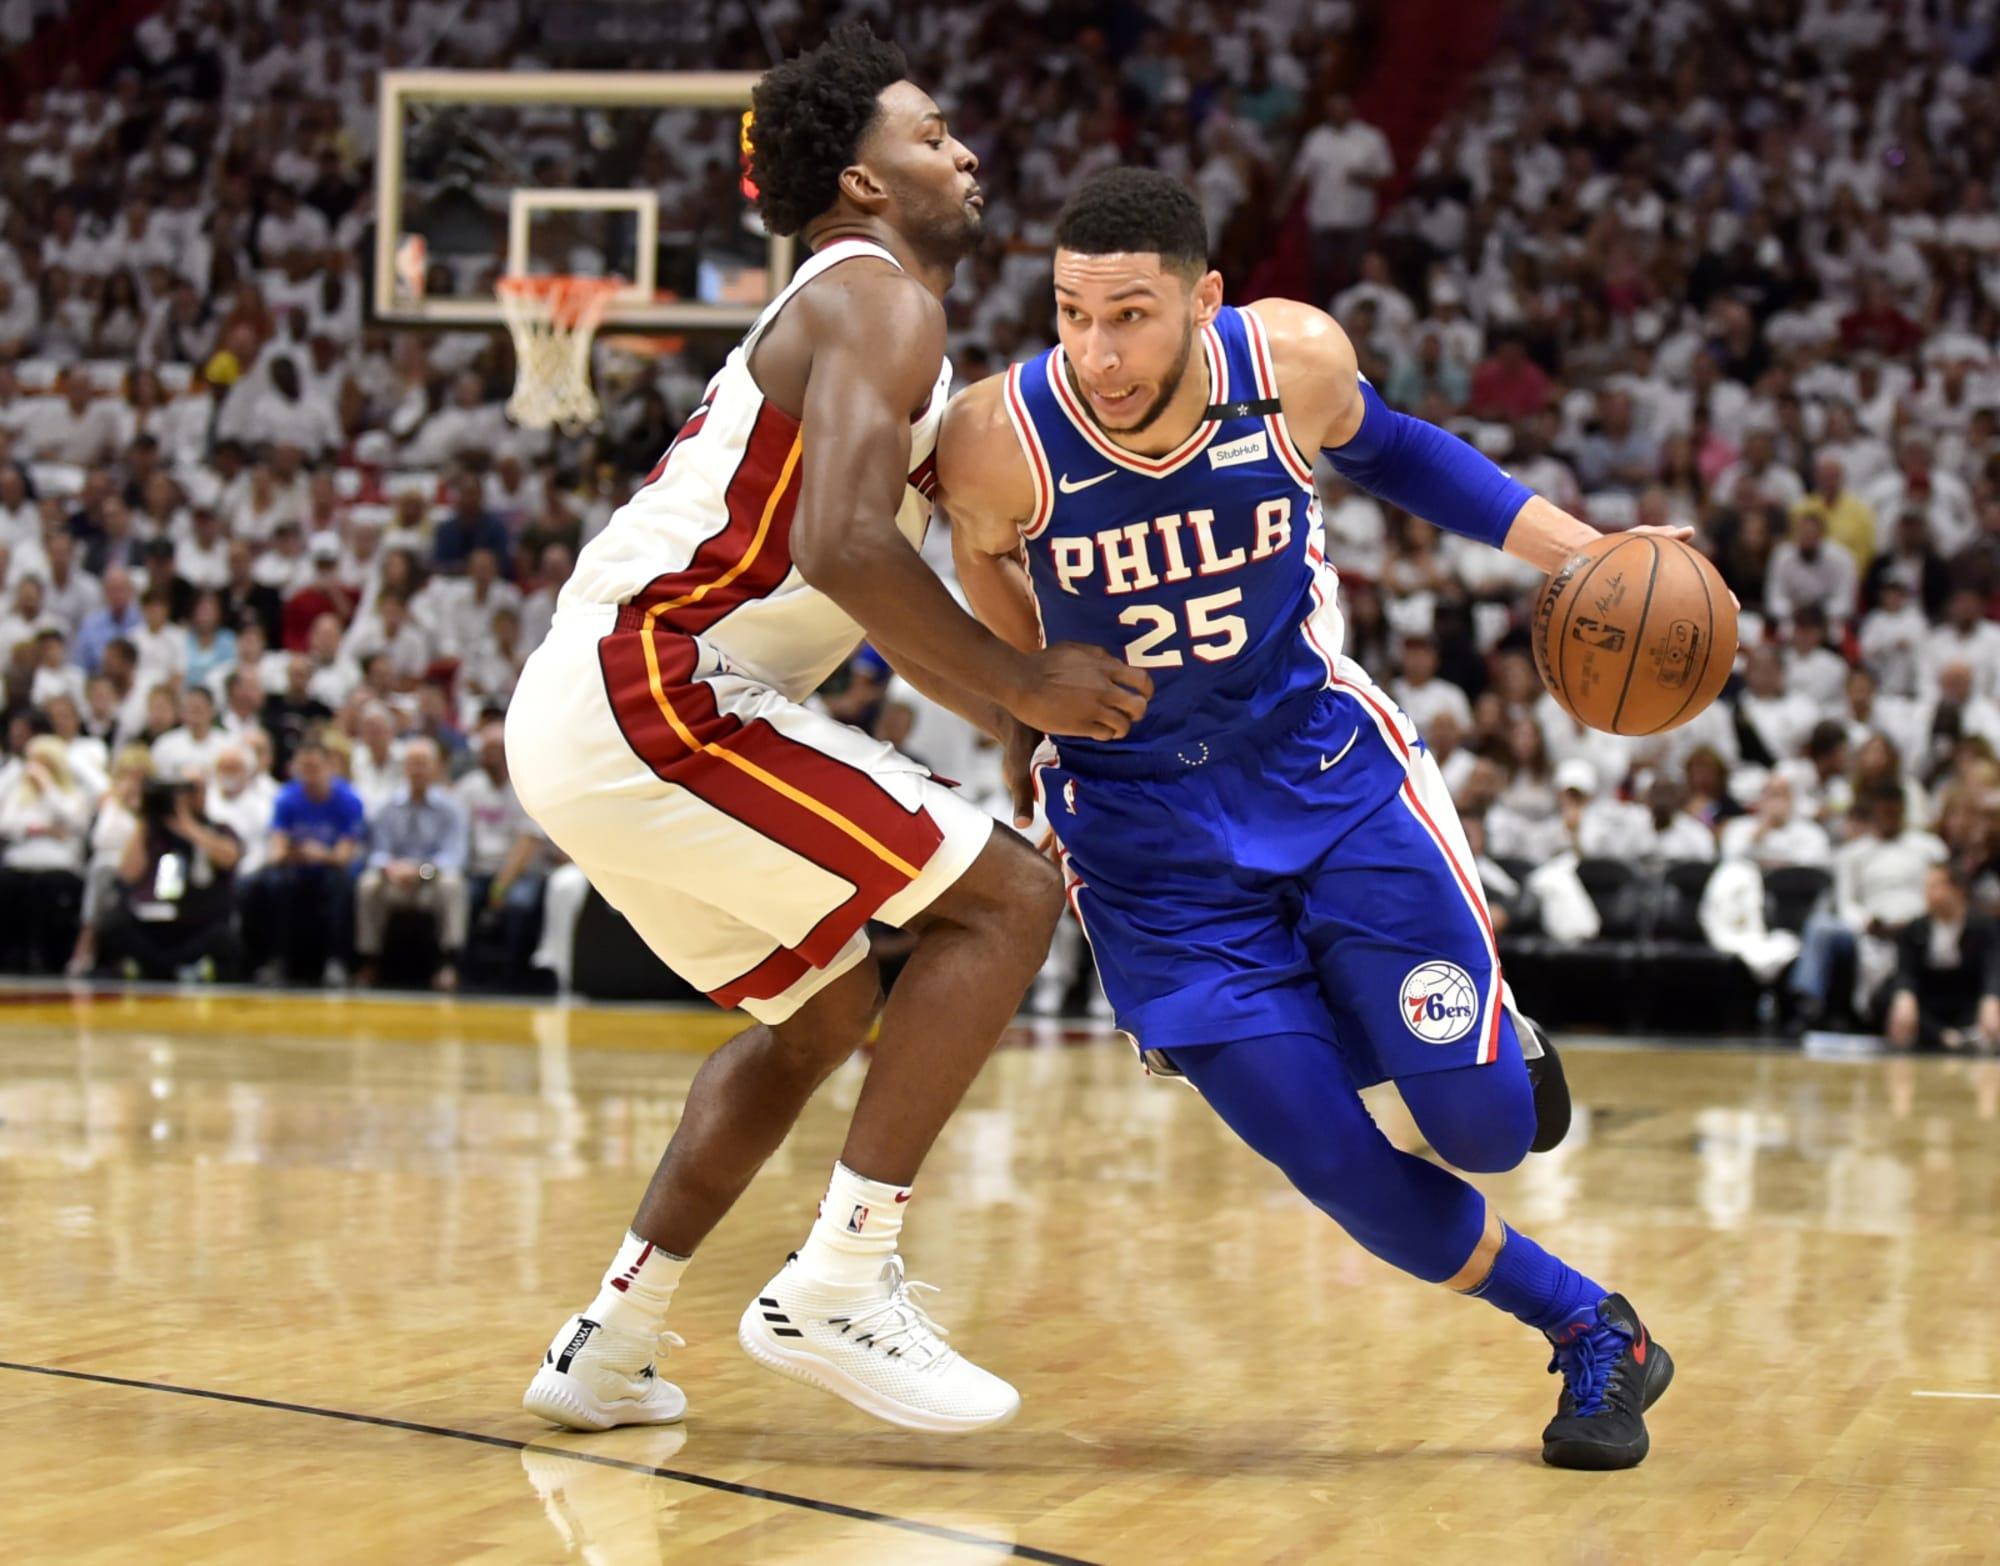 Philadelphia 76ers vs. Miami Heat: Game 3 observations